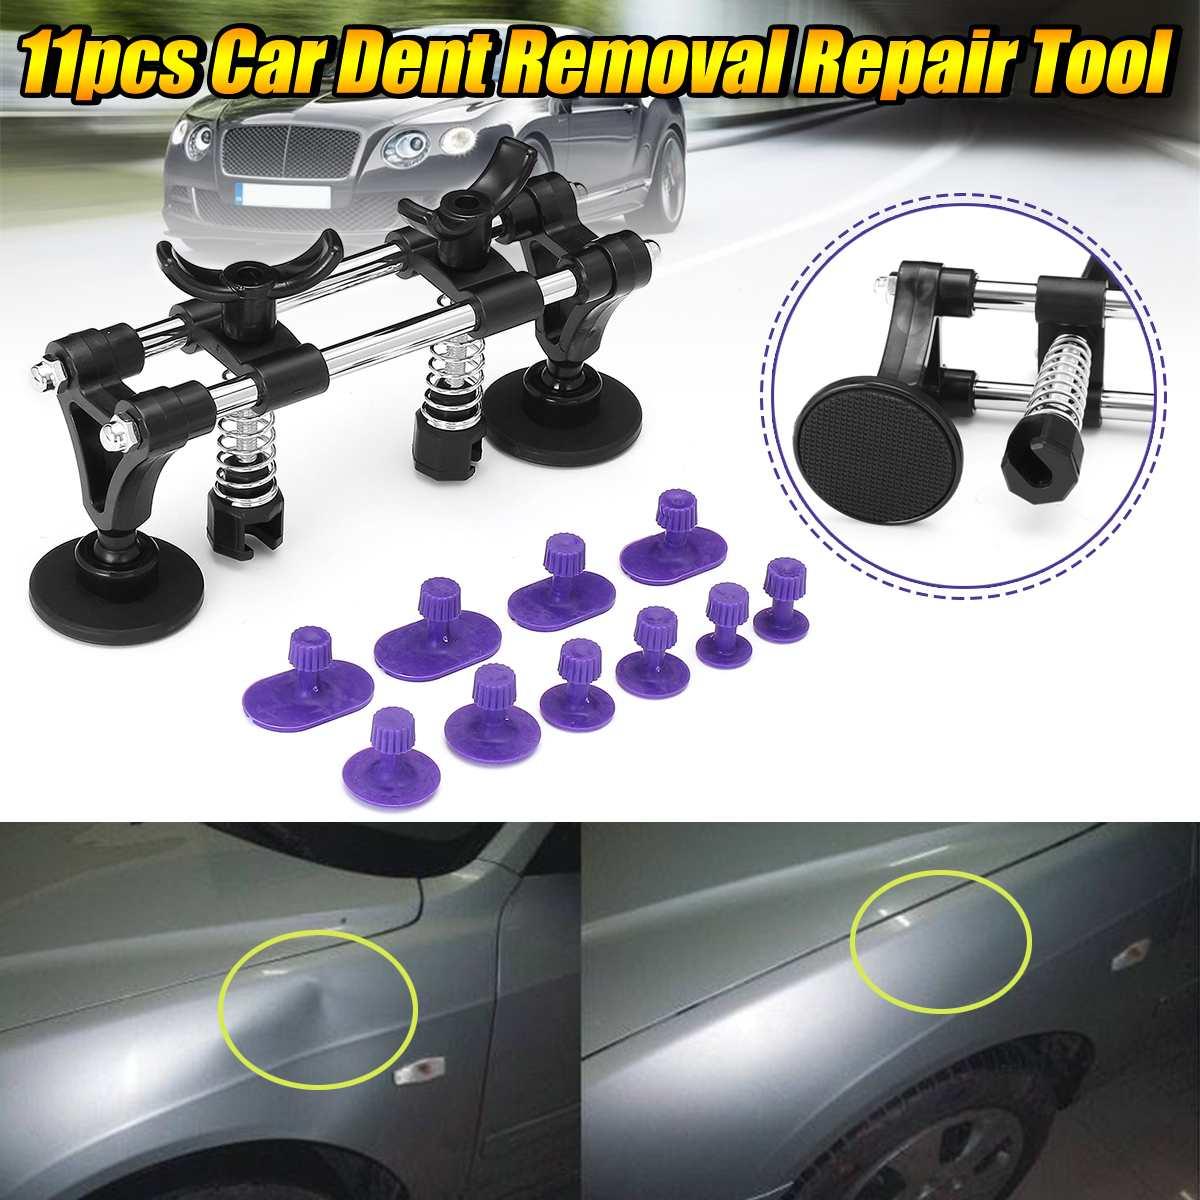 1set Paintless Dent Repair Dent Puller Kit Car Auto Body Removal Slide Suction Cup Bridge Set Car Damage Maintence Repair Tool